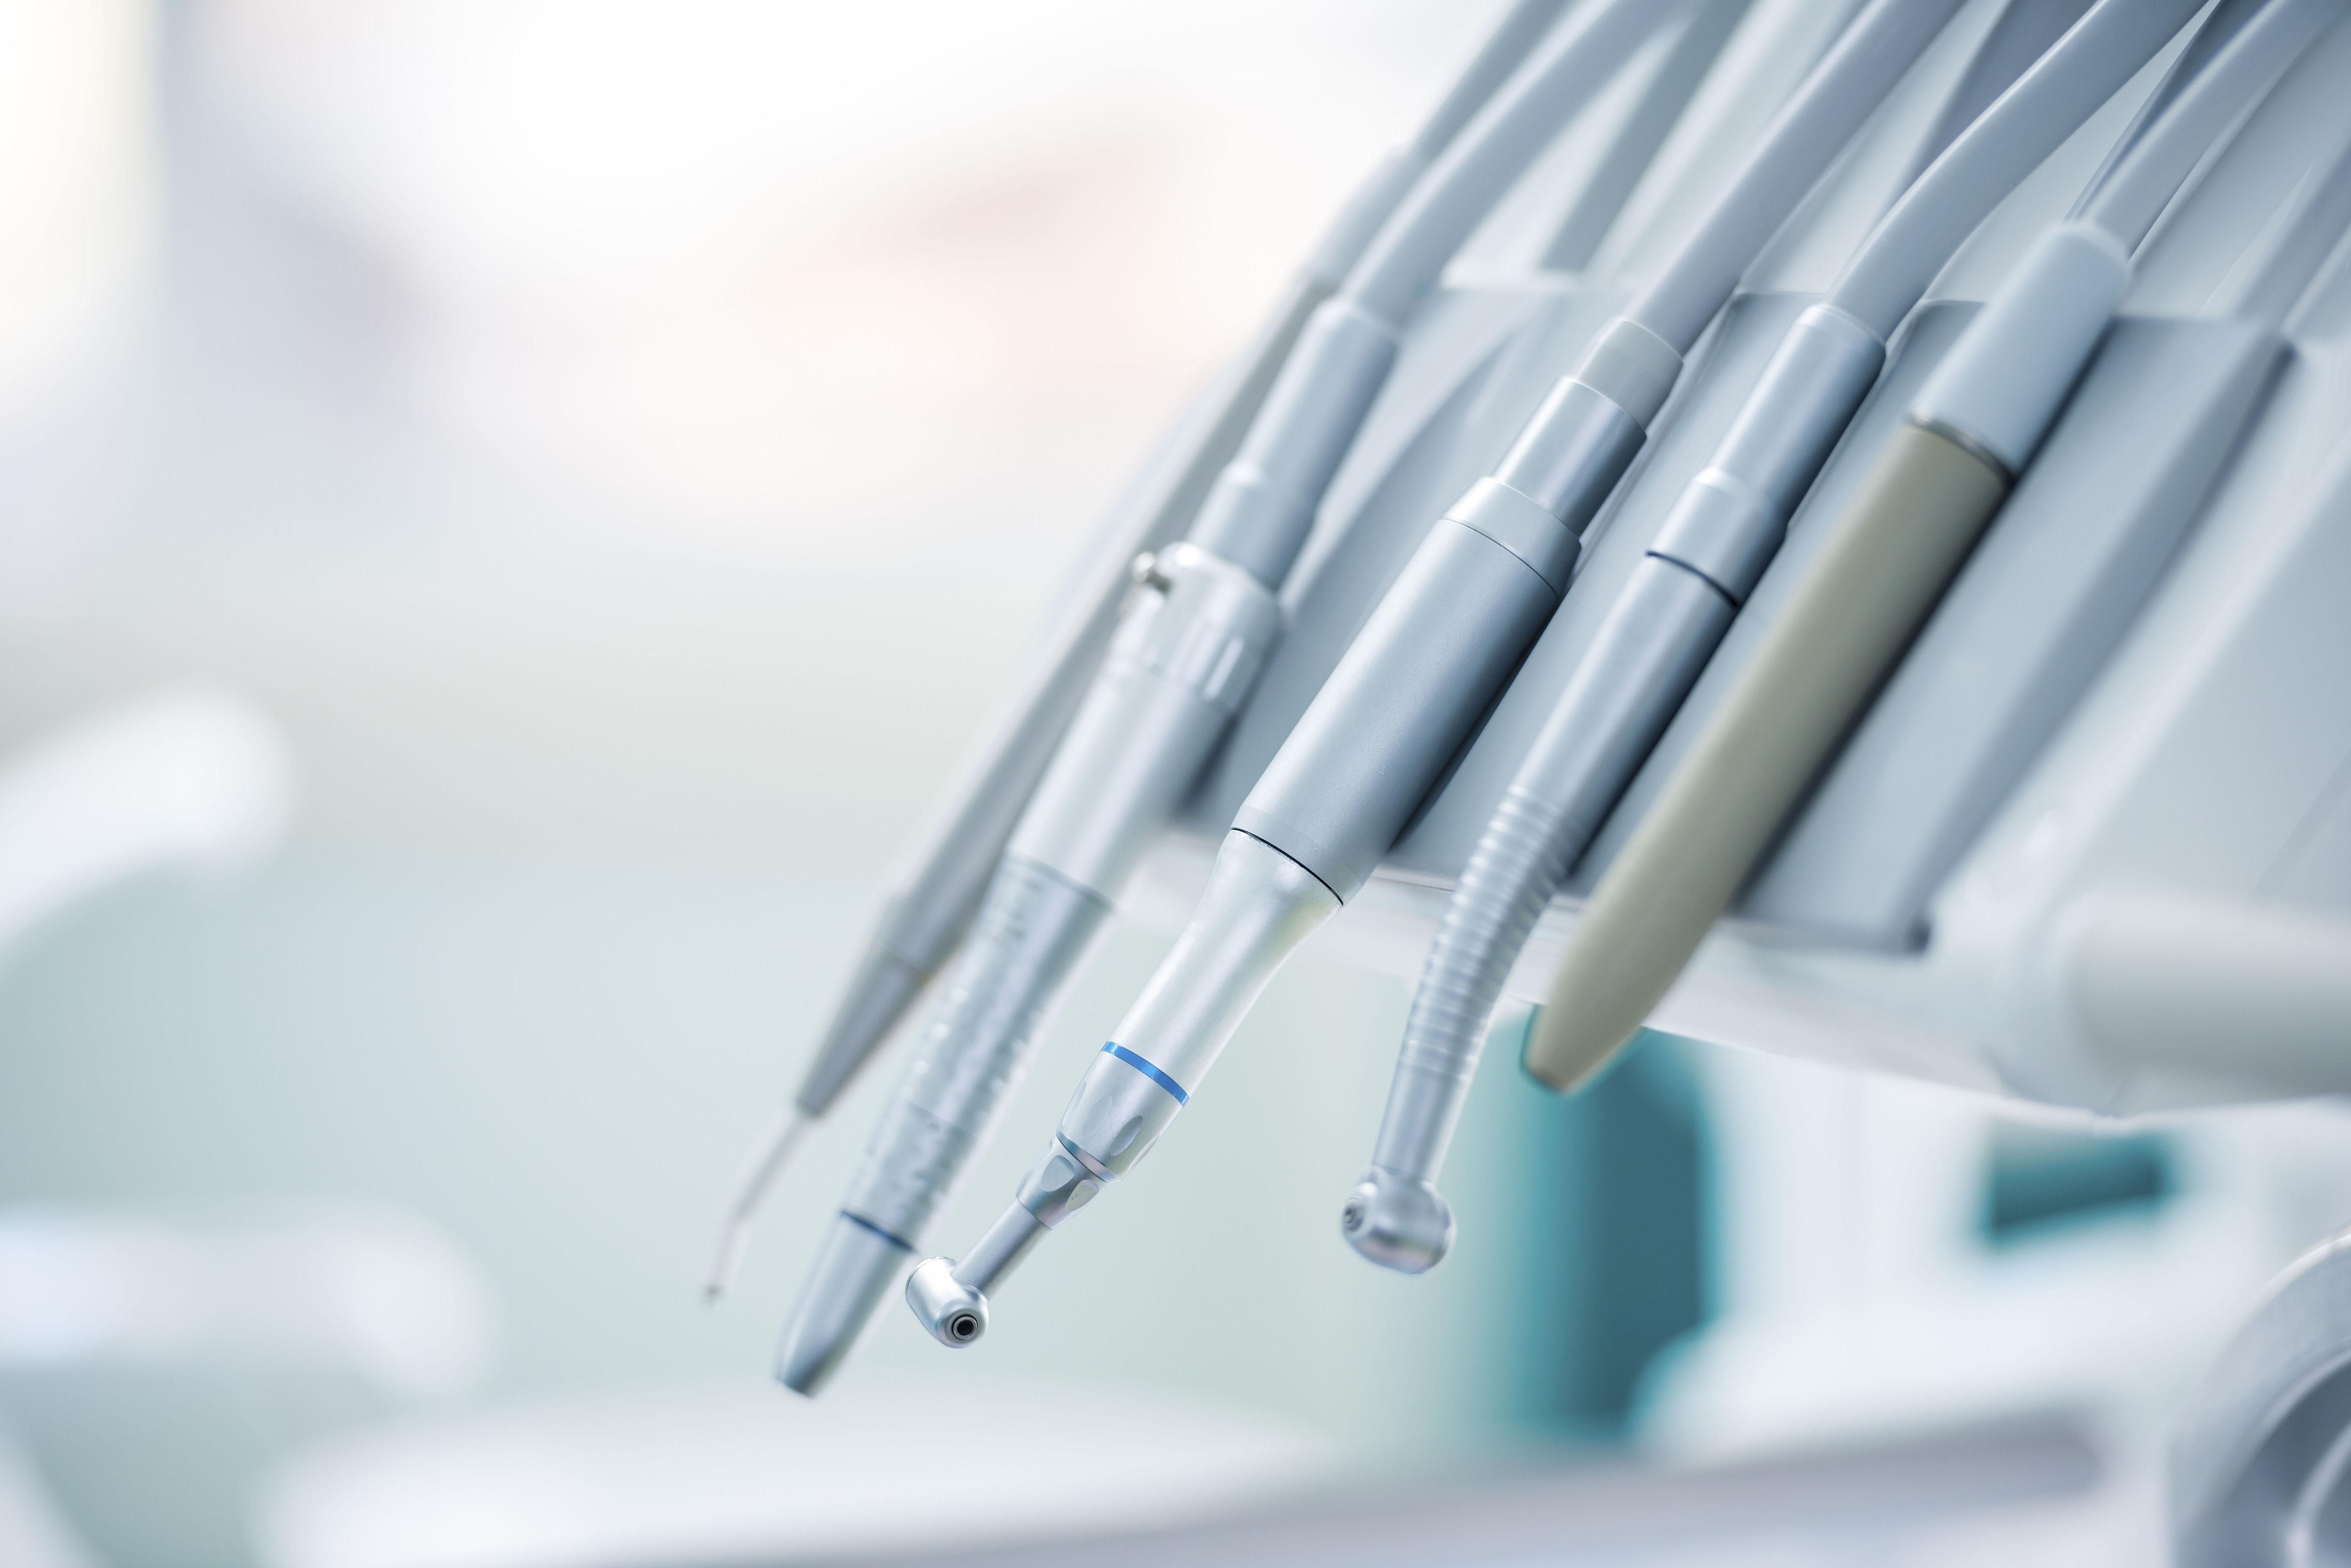 Periodoncia y prótesis dentales en Palau-solità i Plegamans